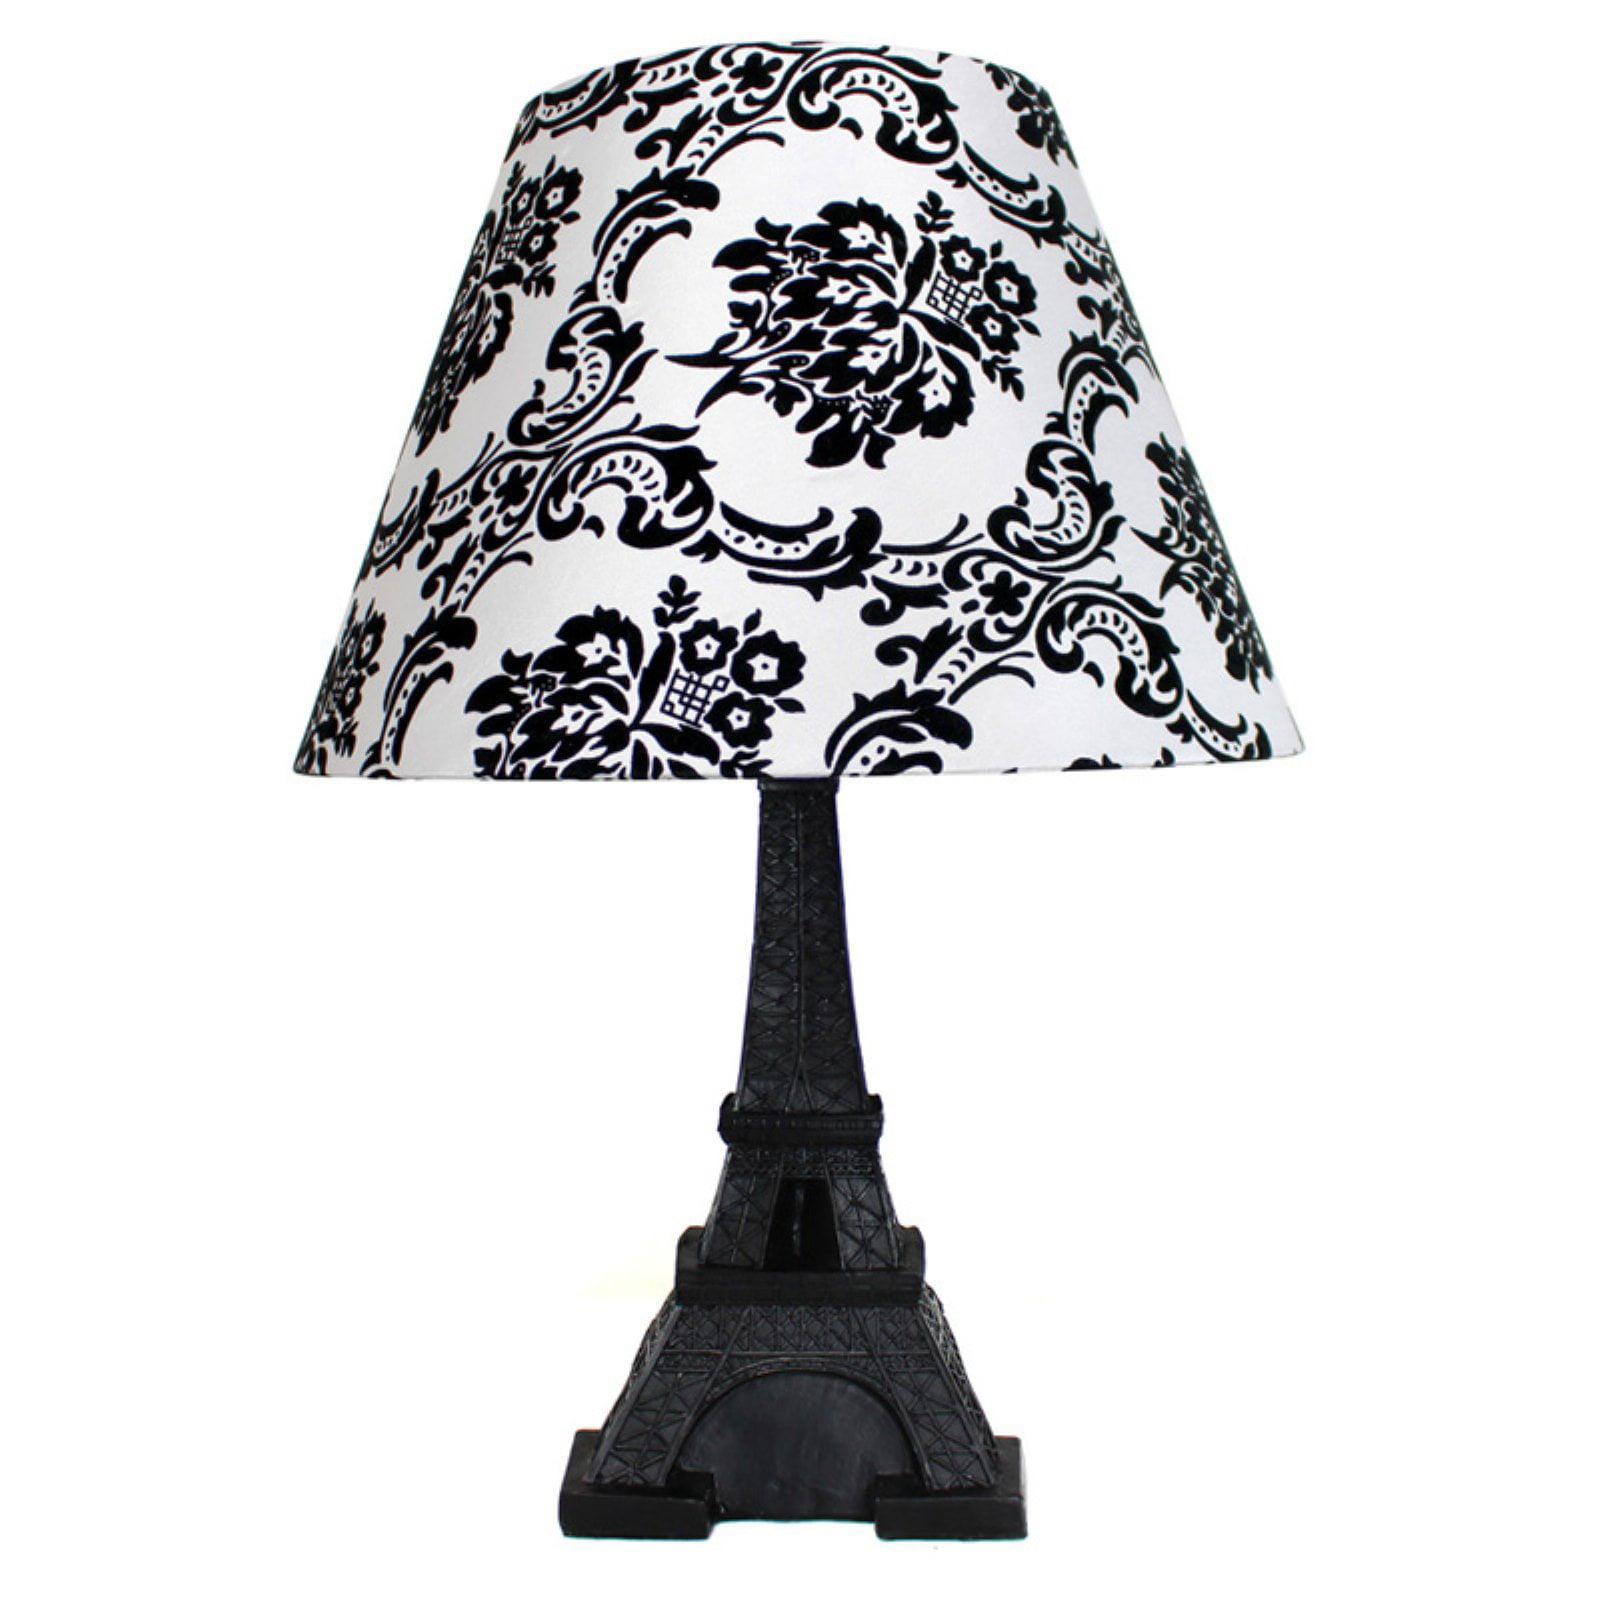 Simple Designs LT3010-DSK Eiffel Tower Paris Table Lamp